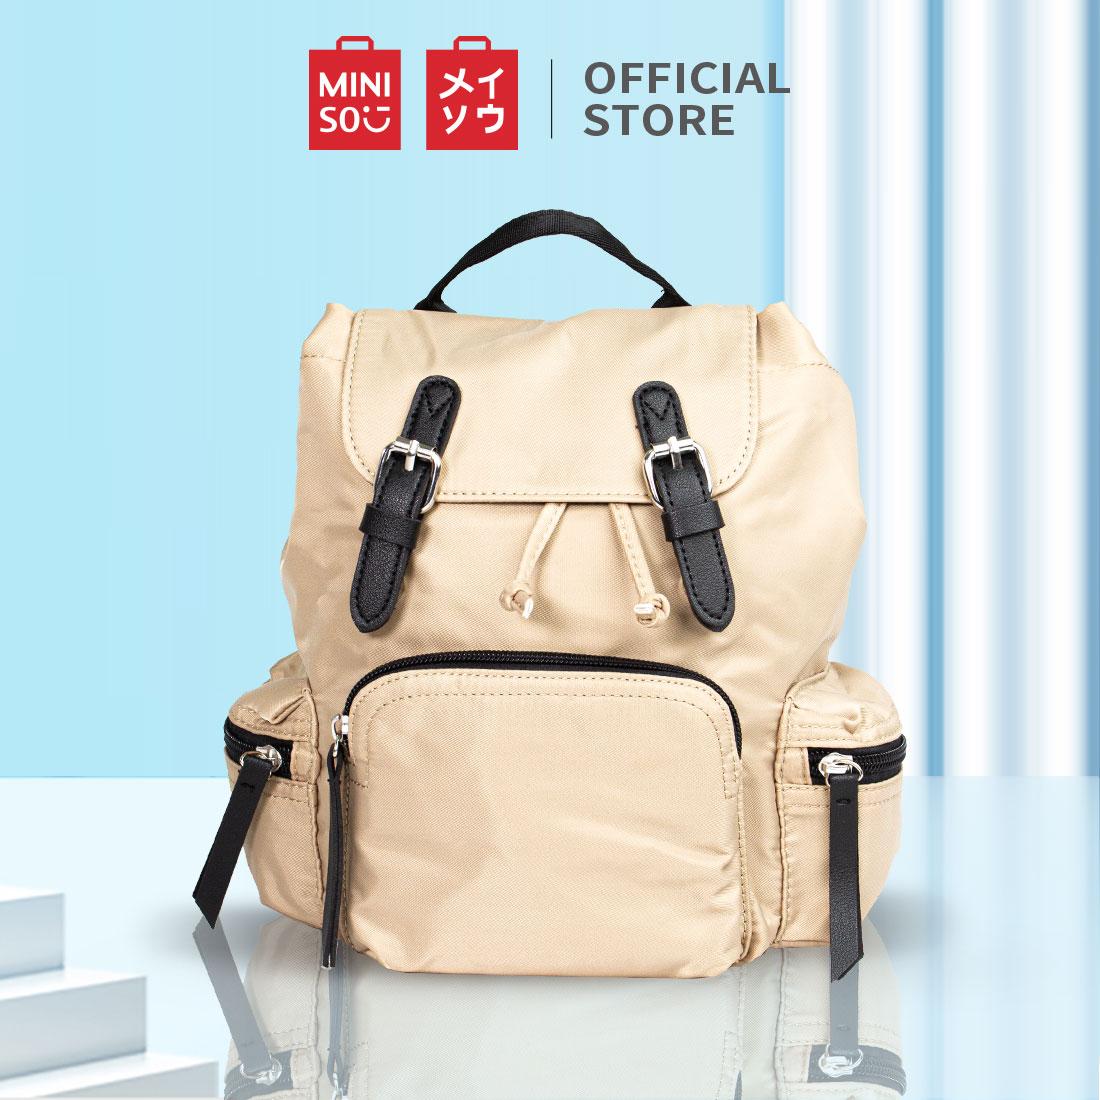 Dimana Beli Miniso Minigo Tas Ransel Backpack Lipat 13l ...